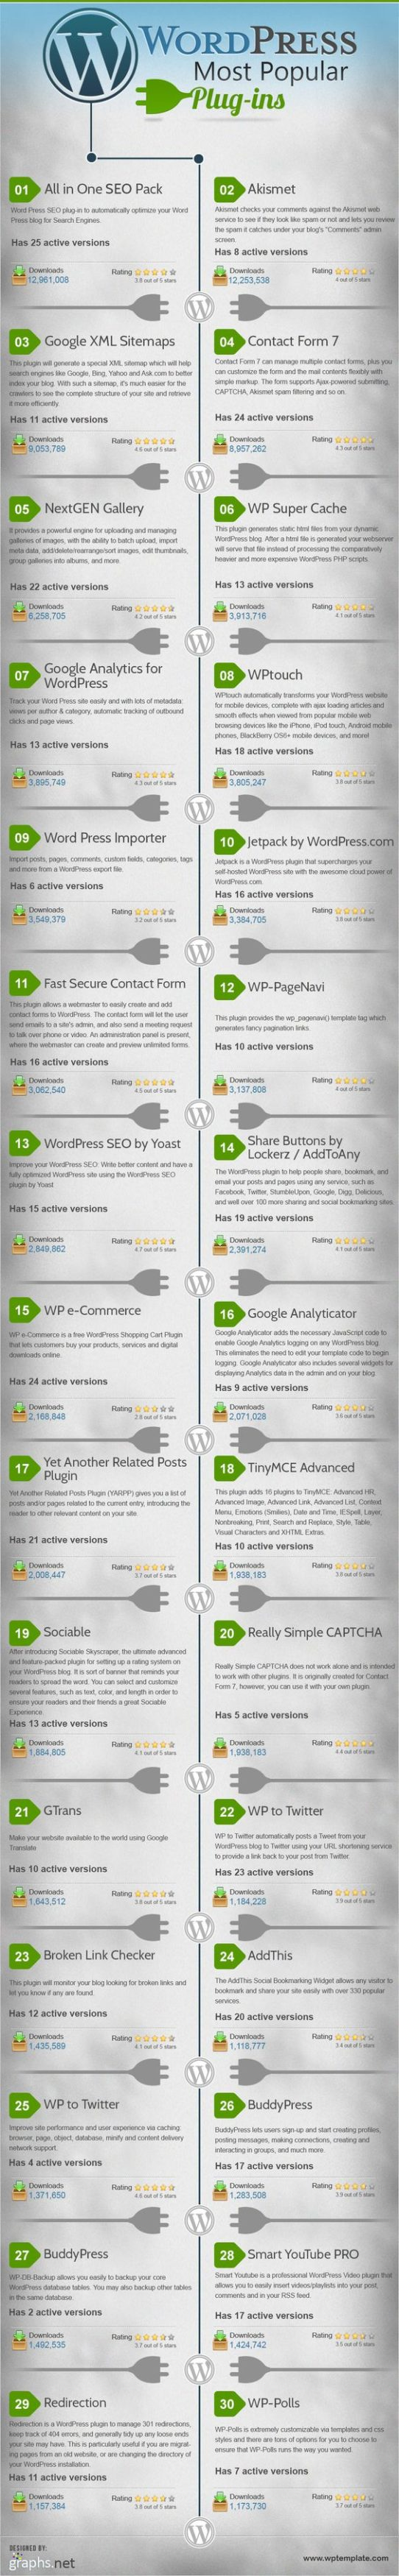 Die beliebtesten WordPress Plugins